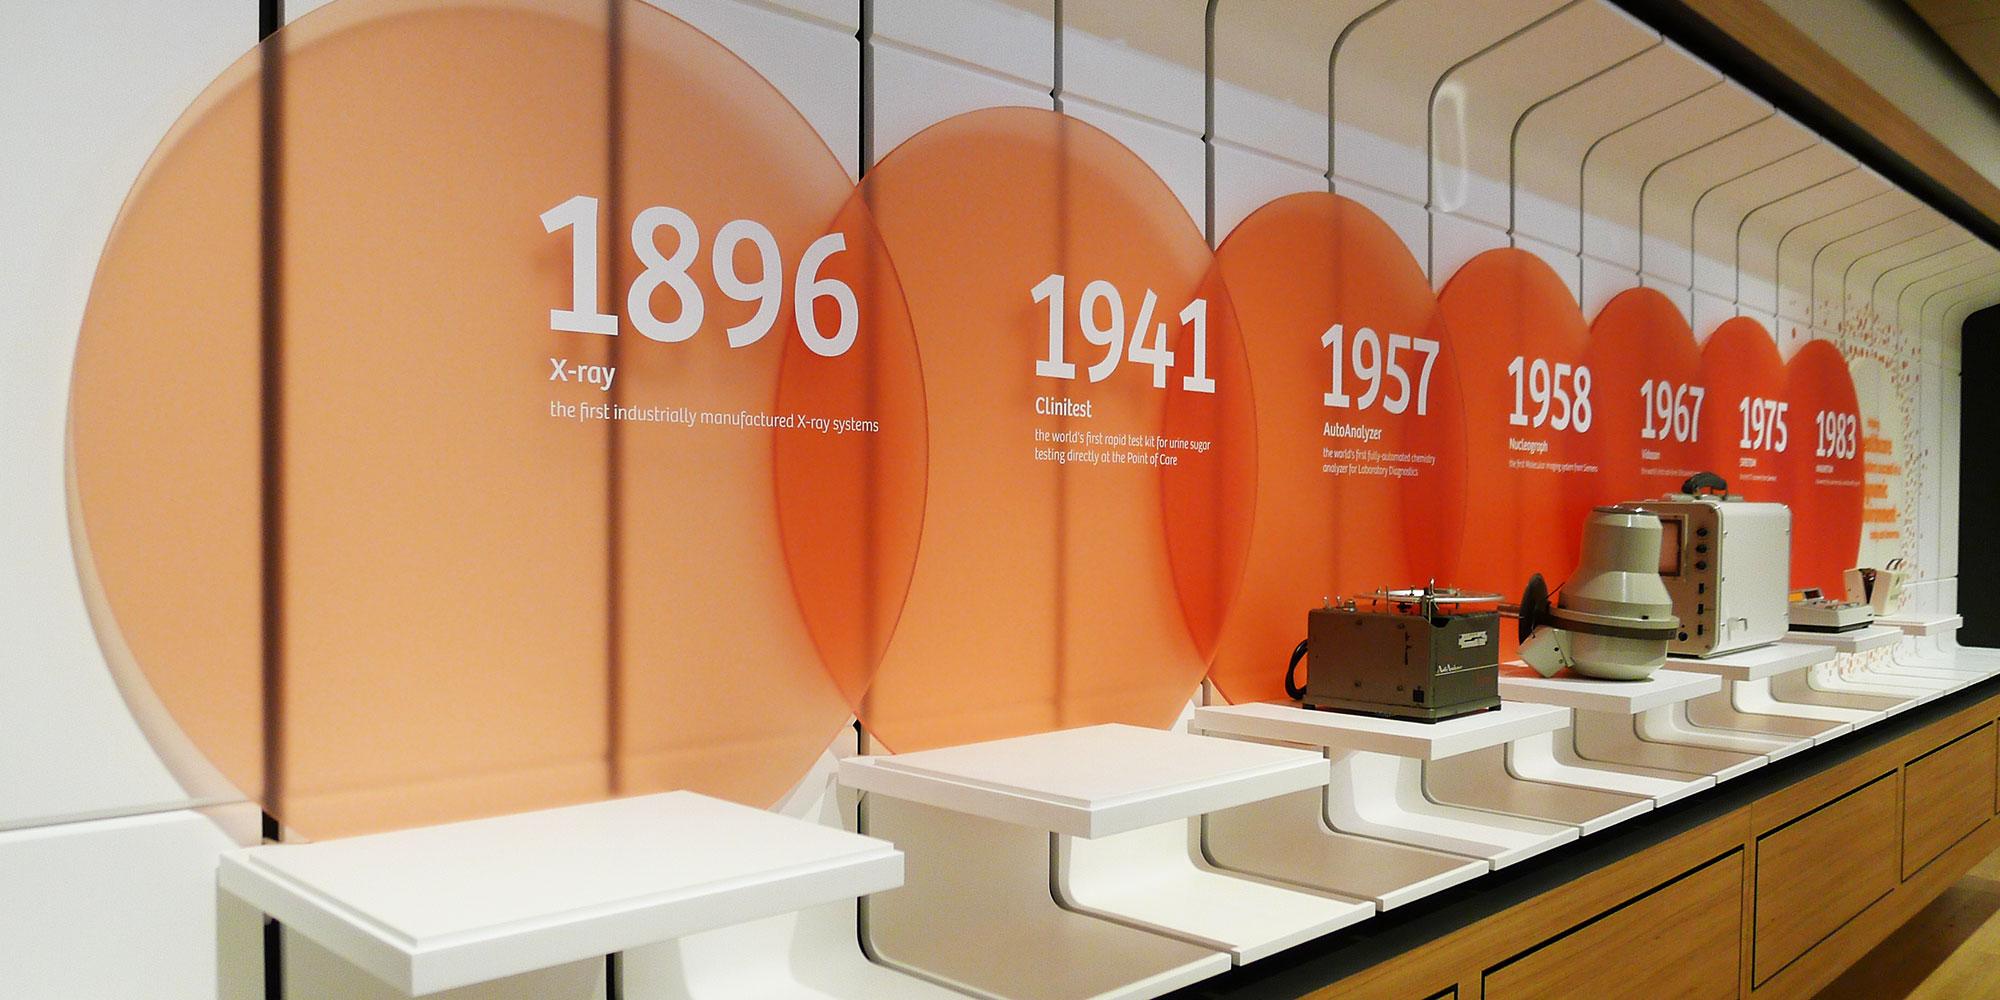 Siemens Showroom, Forchheim